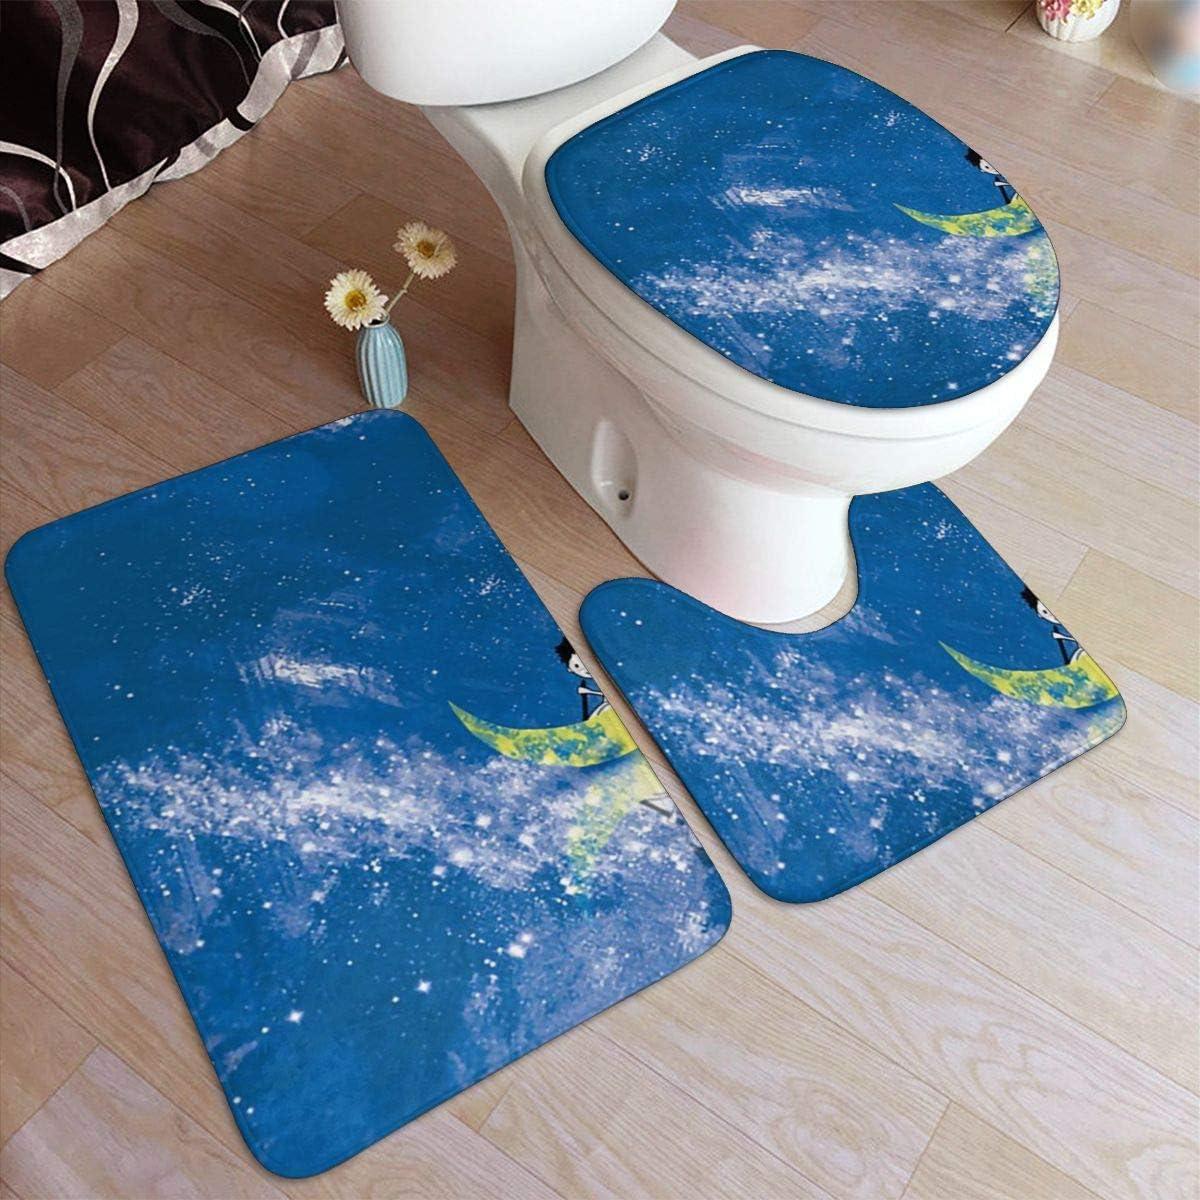 Bathroom Non-Slip Pedestal Rug+Lid Toilet Cover+Bath Mat 3PCS /& Toilet Seat Mats